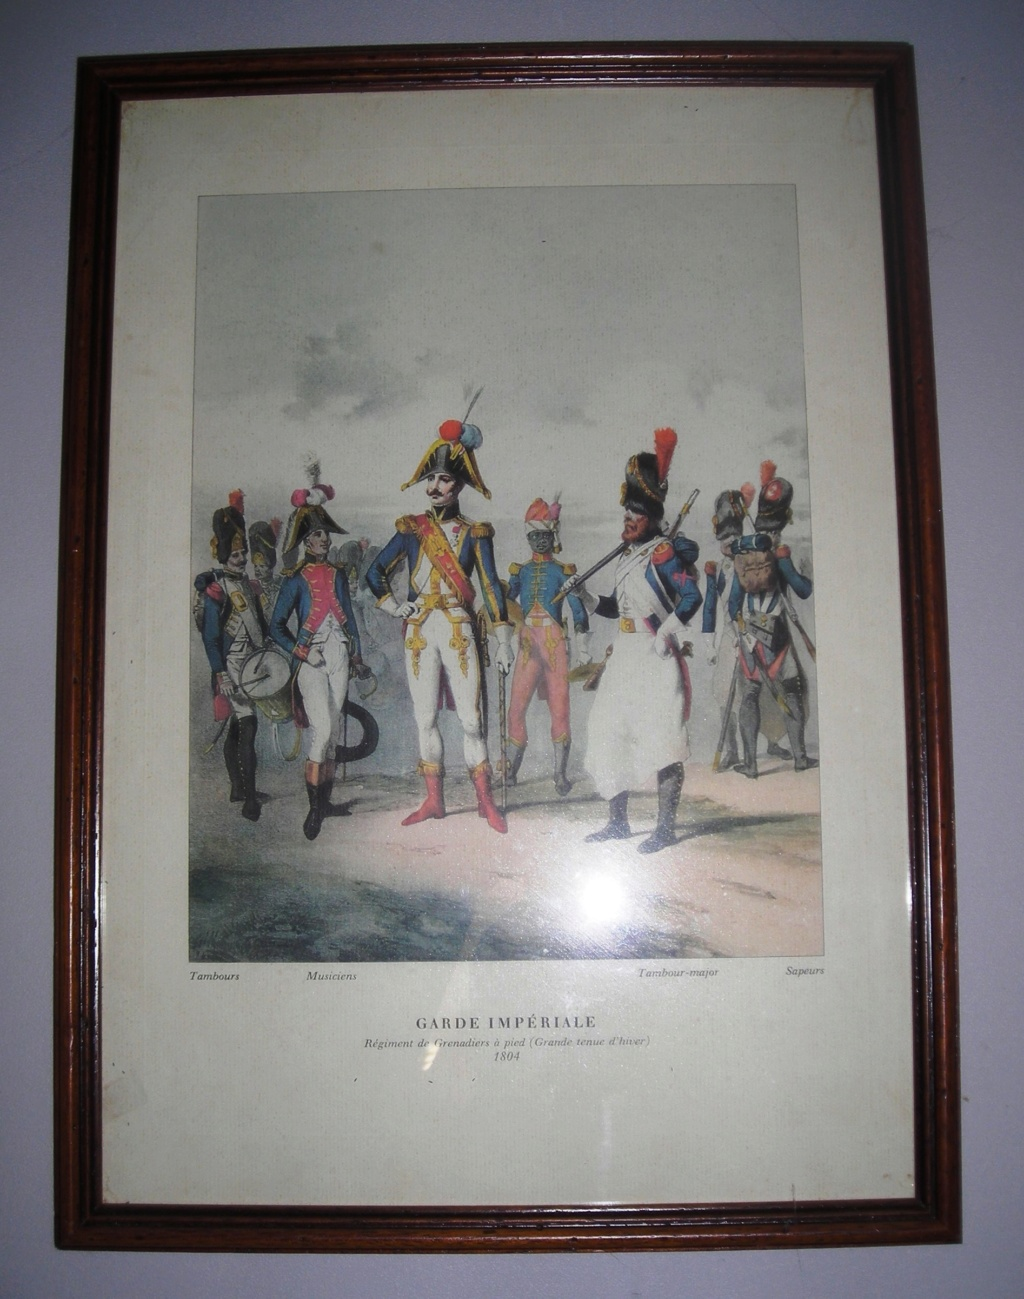 VENTE GRAVURES PREMIER EMPIRE, GARDE IMPERIALE. 180411